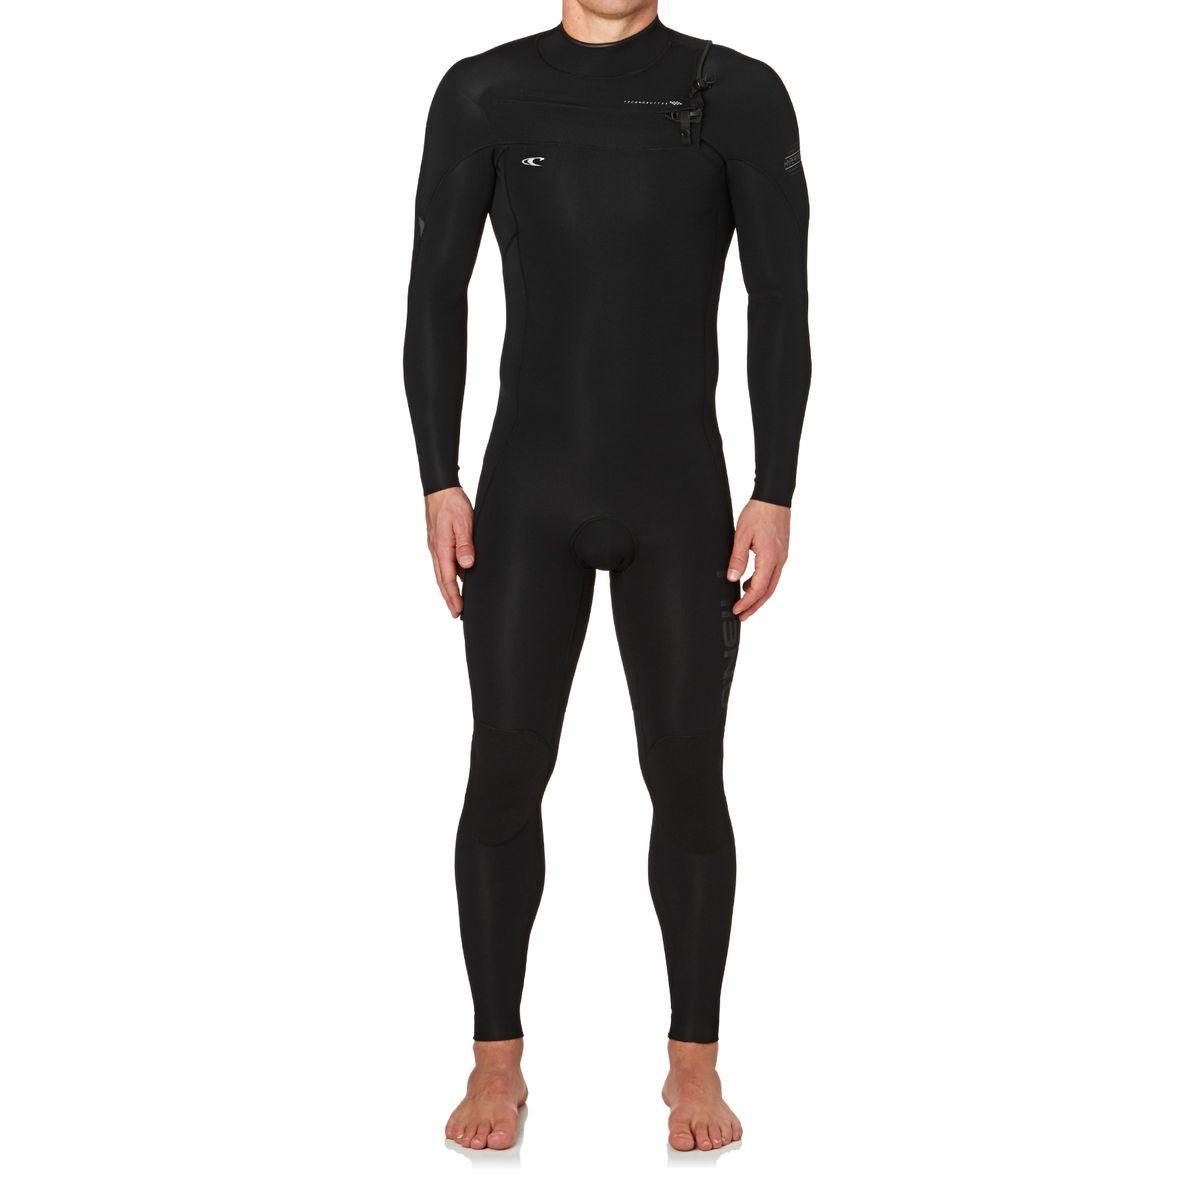 O'Neill Hyperfreak 3/2mm 2017 Chest Zip Wetsuit - Black/ Black/ Graphite